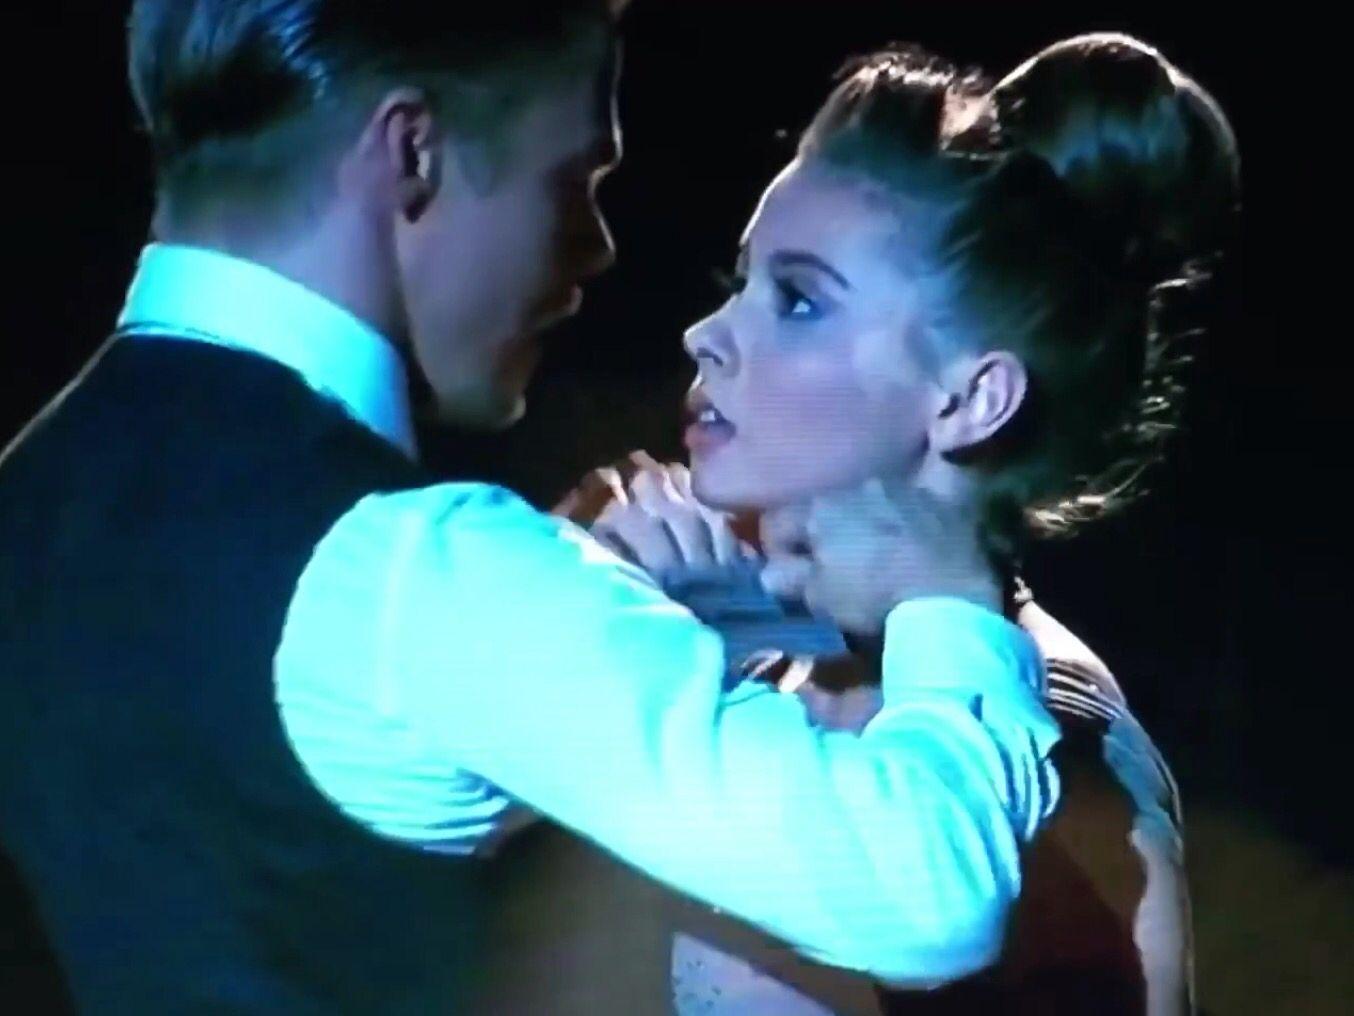 Bindi Irwin and Derek Hough in Dancing with the Stars Season 21.